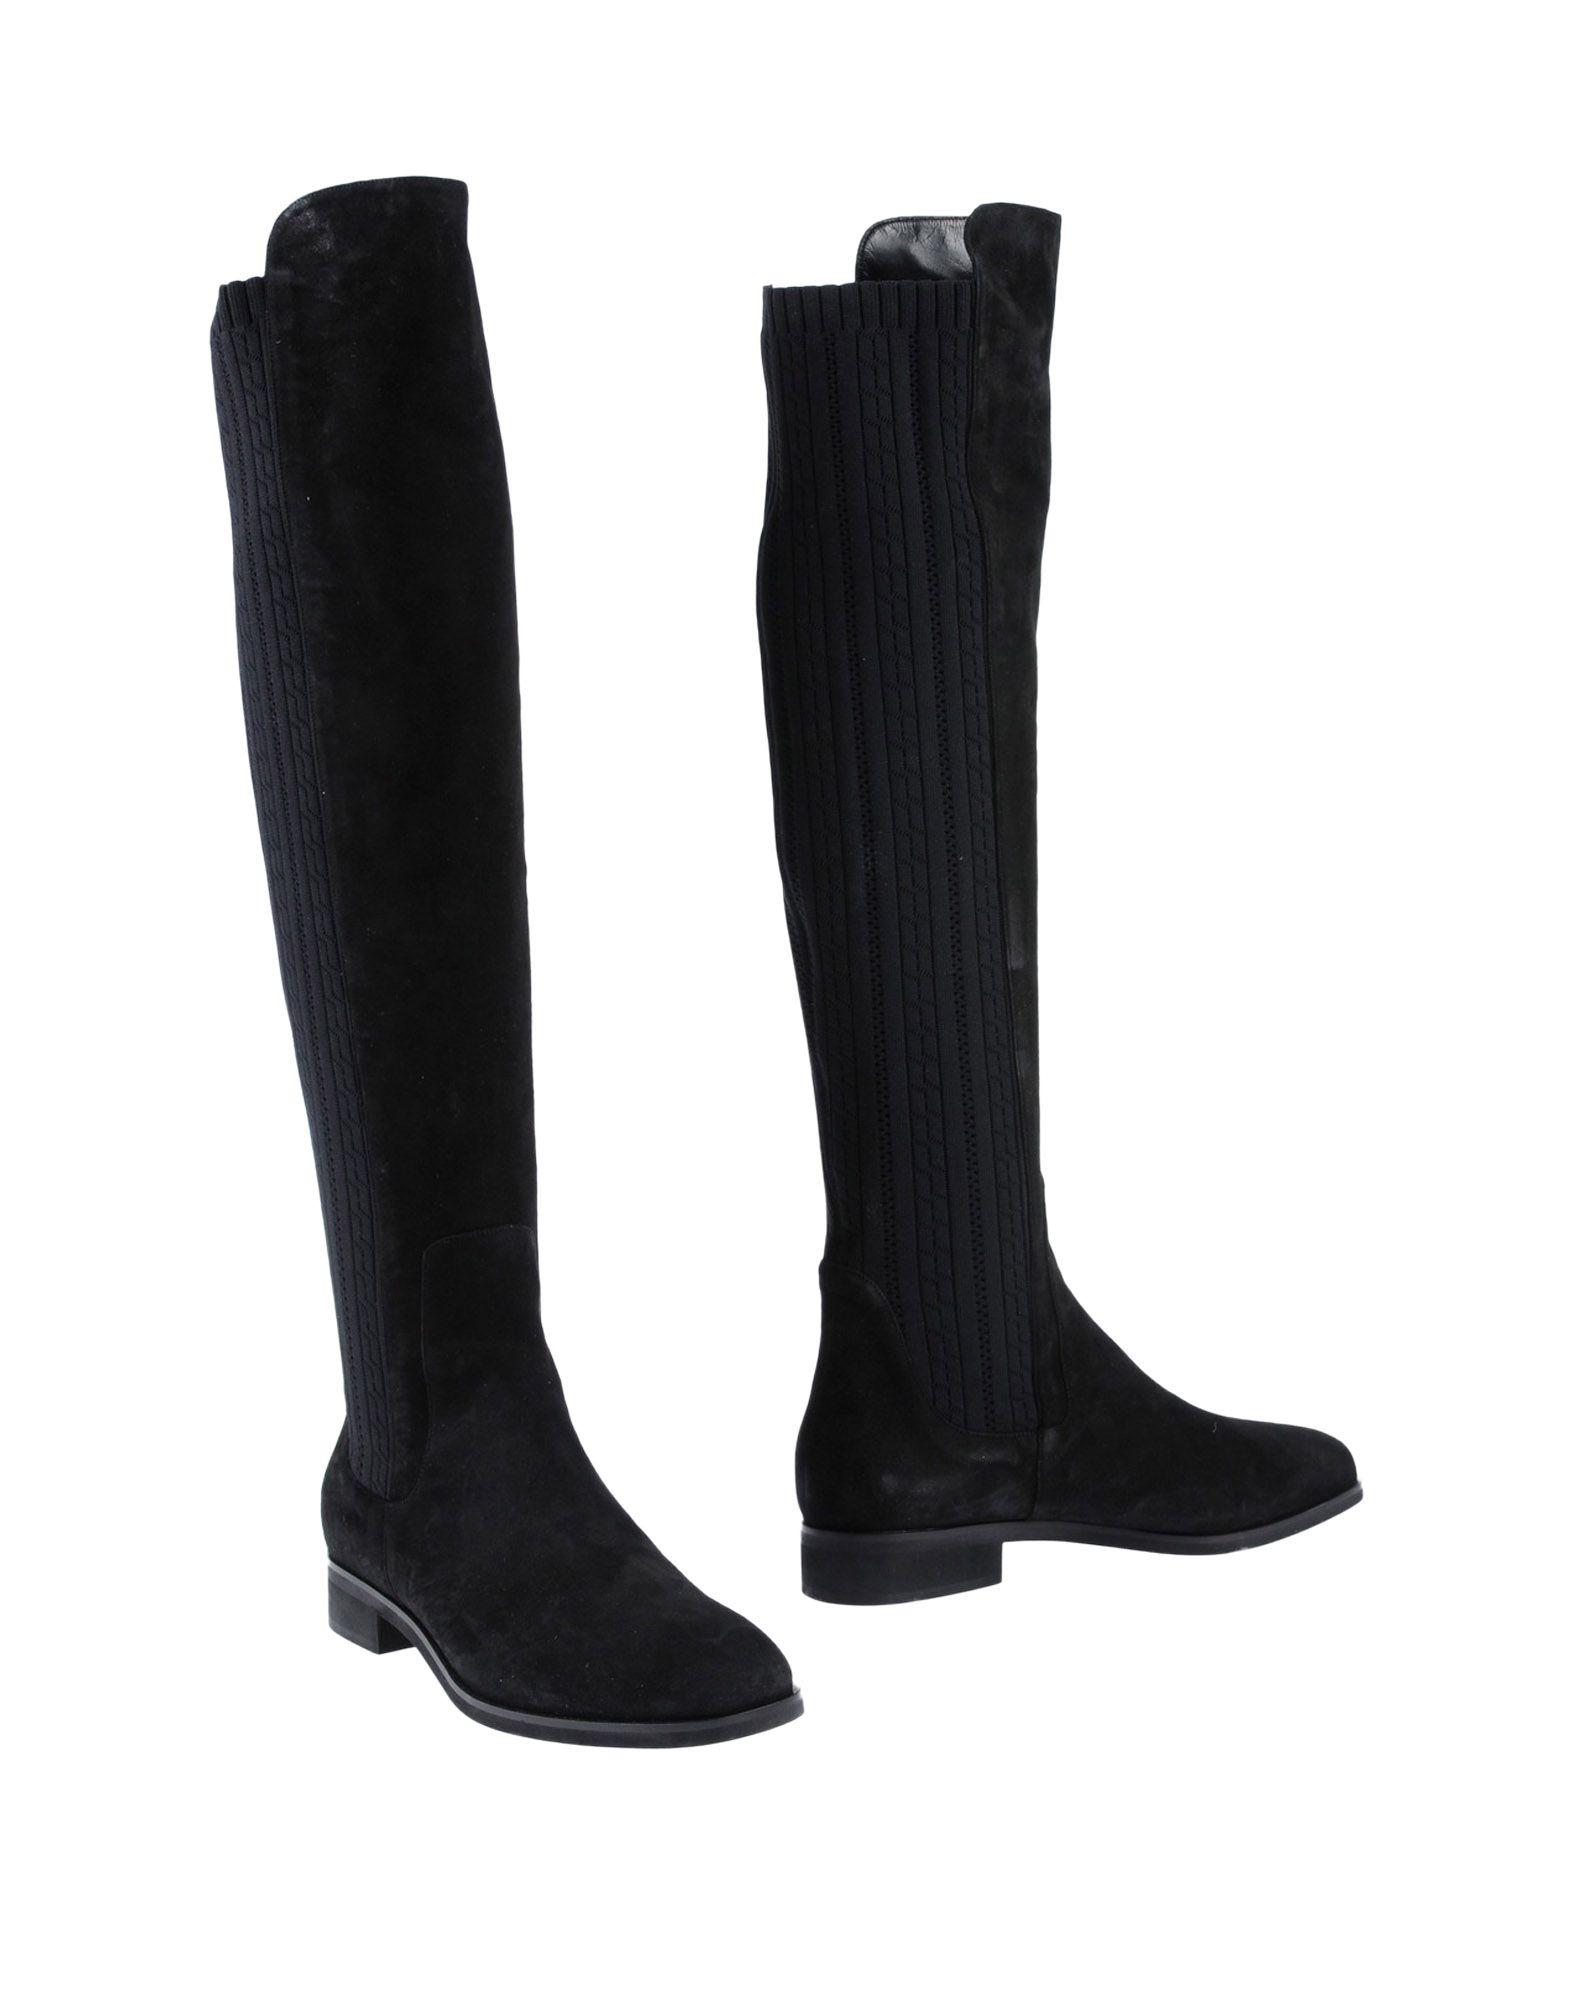 Lella Baldi 11459054DRGut Stiefel Damen  11459054DRGut Baldi aussehende strapazierfähige Schuhe 833f6f